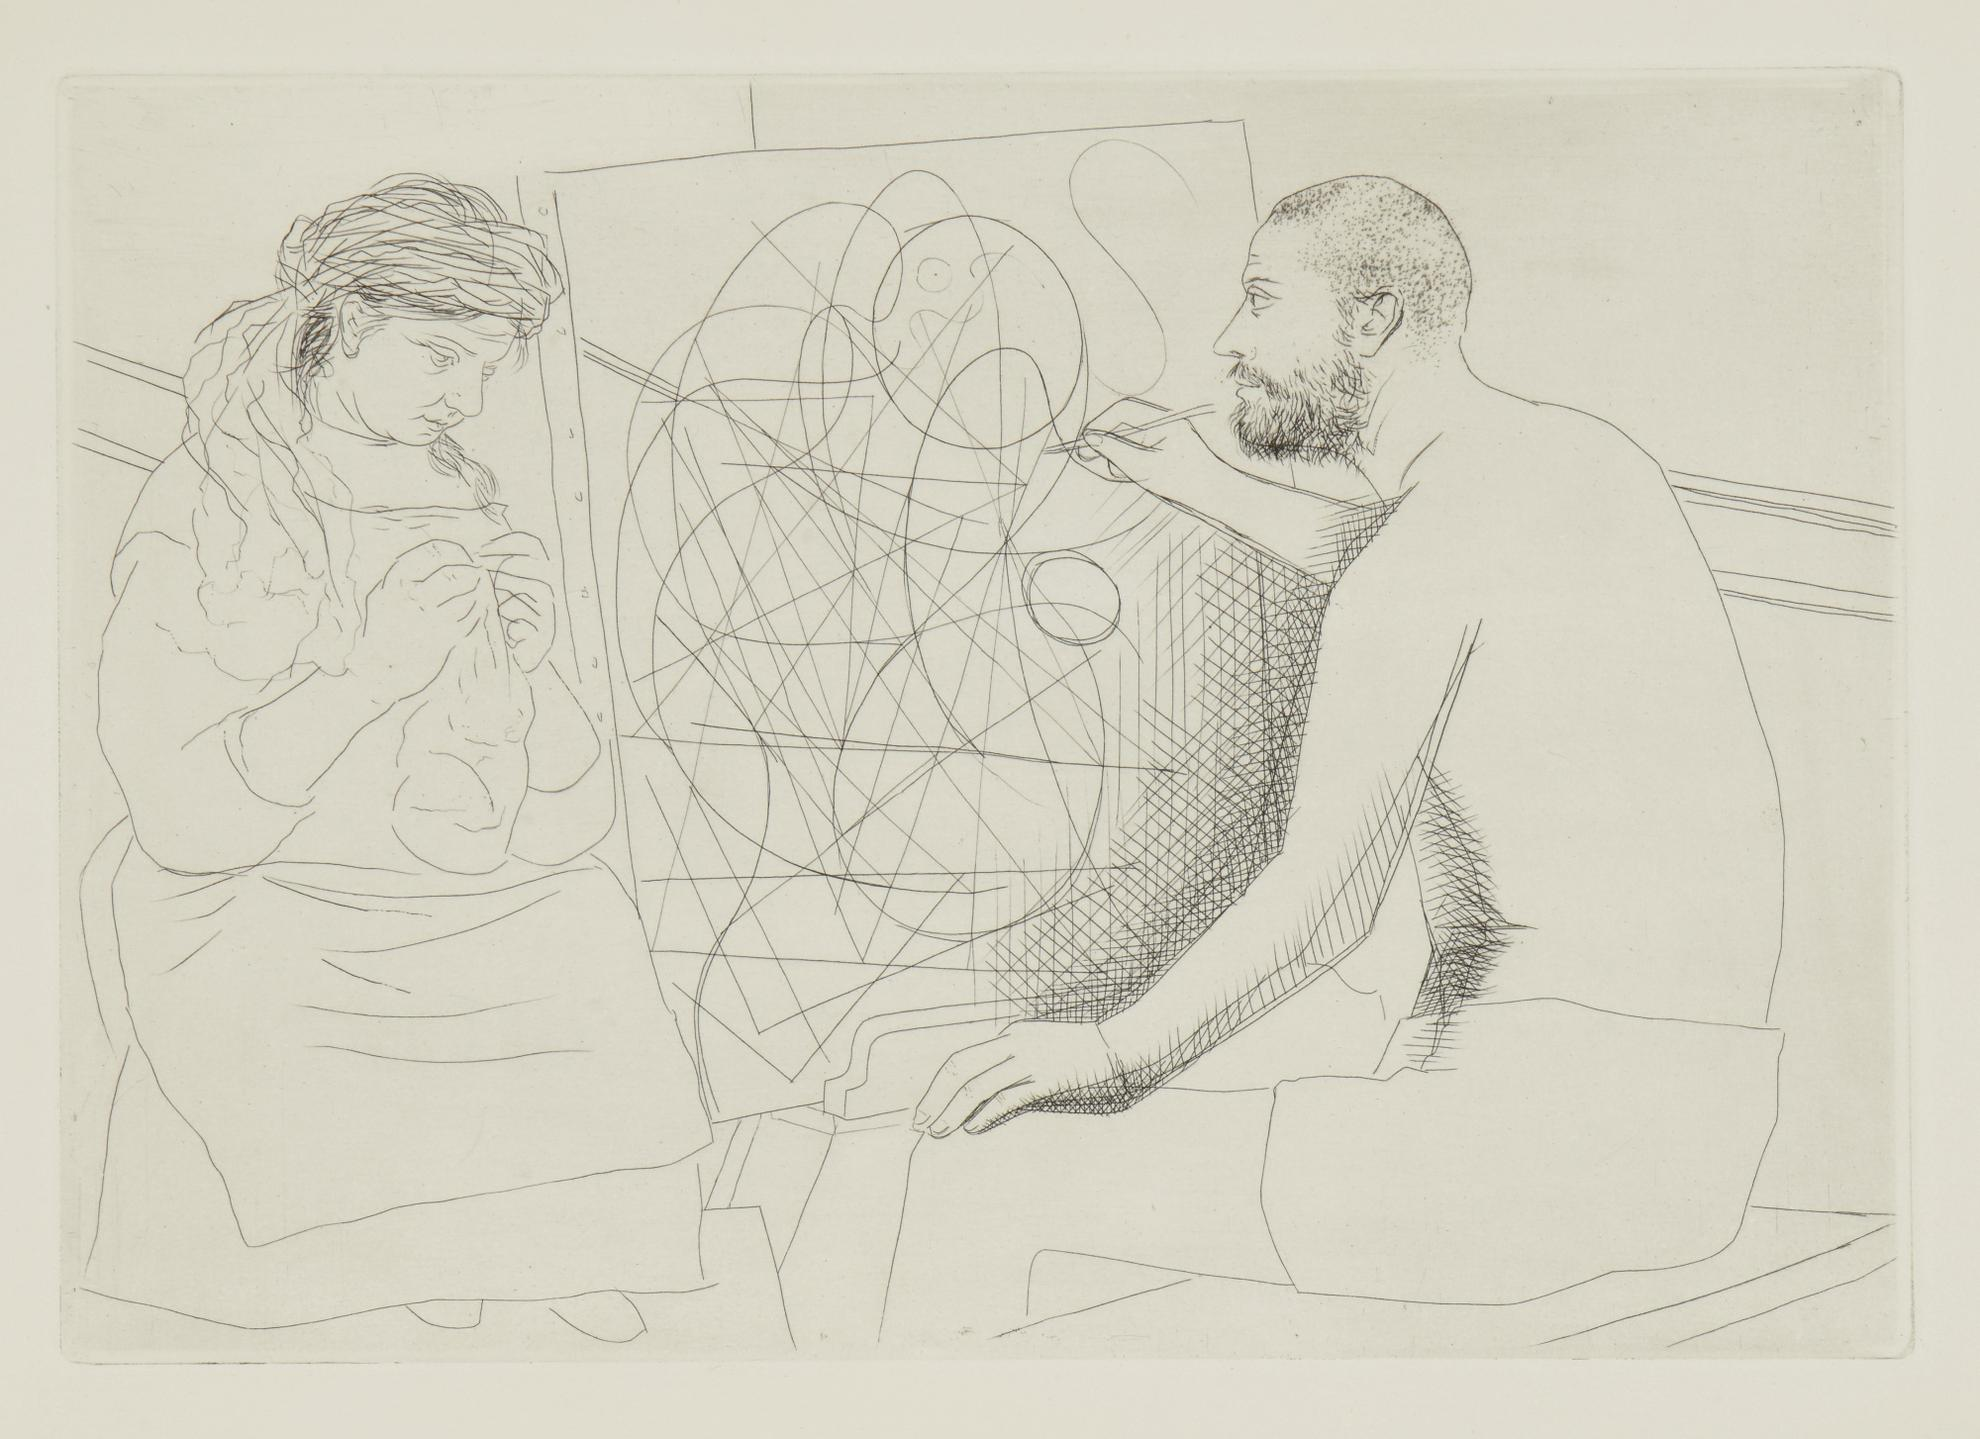 Pablo Picasso-Le Chef-Doeuvre Inconnu (B. 82-94; Ba. 123-45)-1931